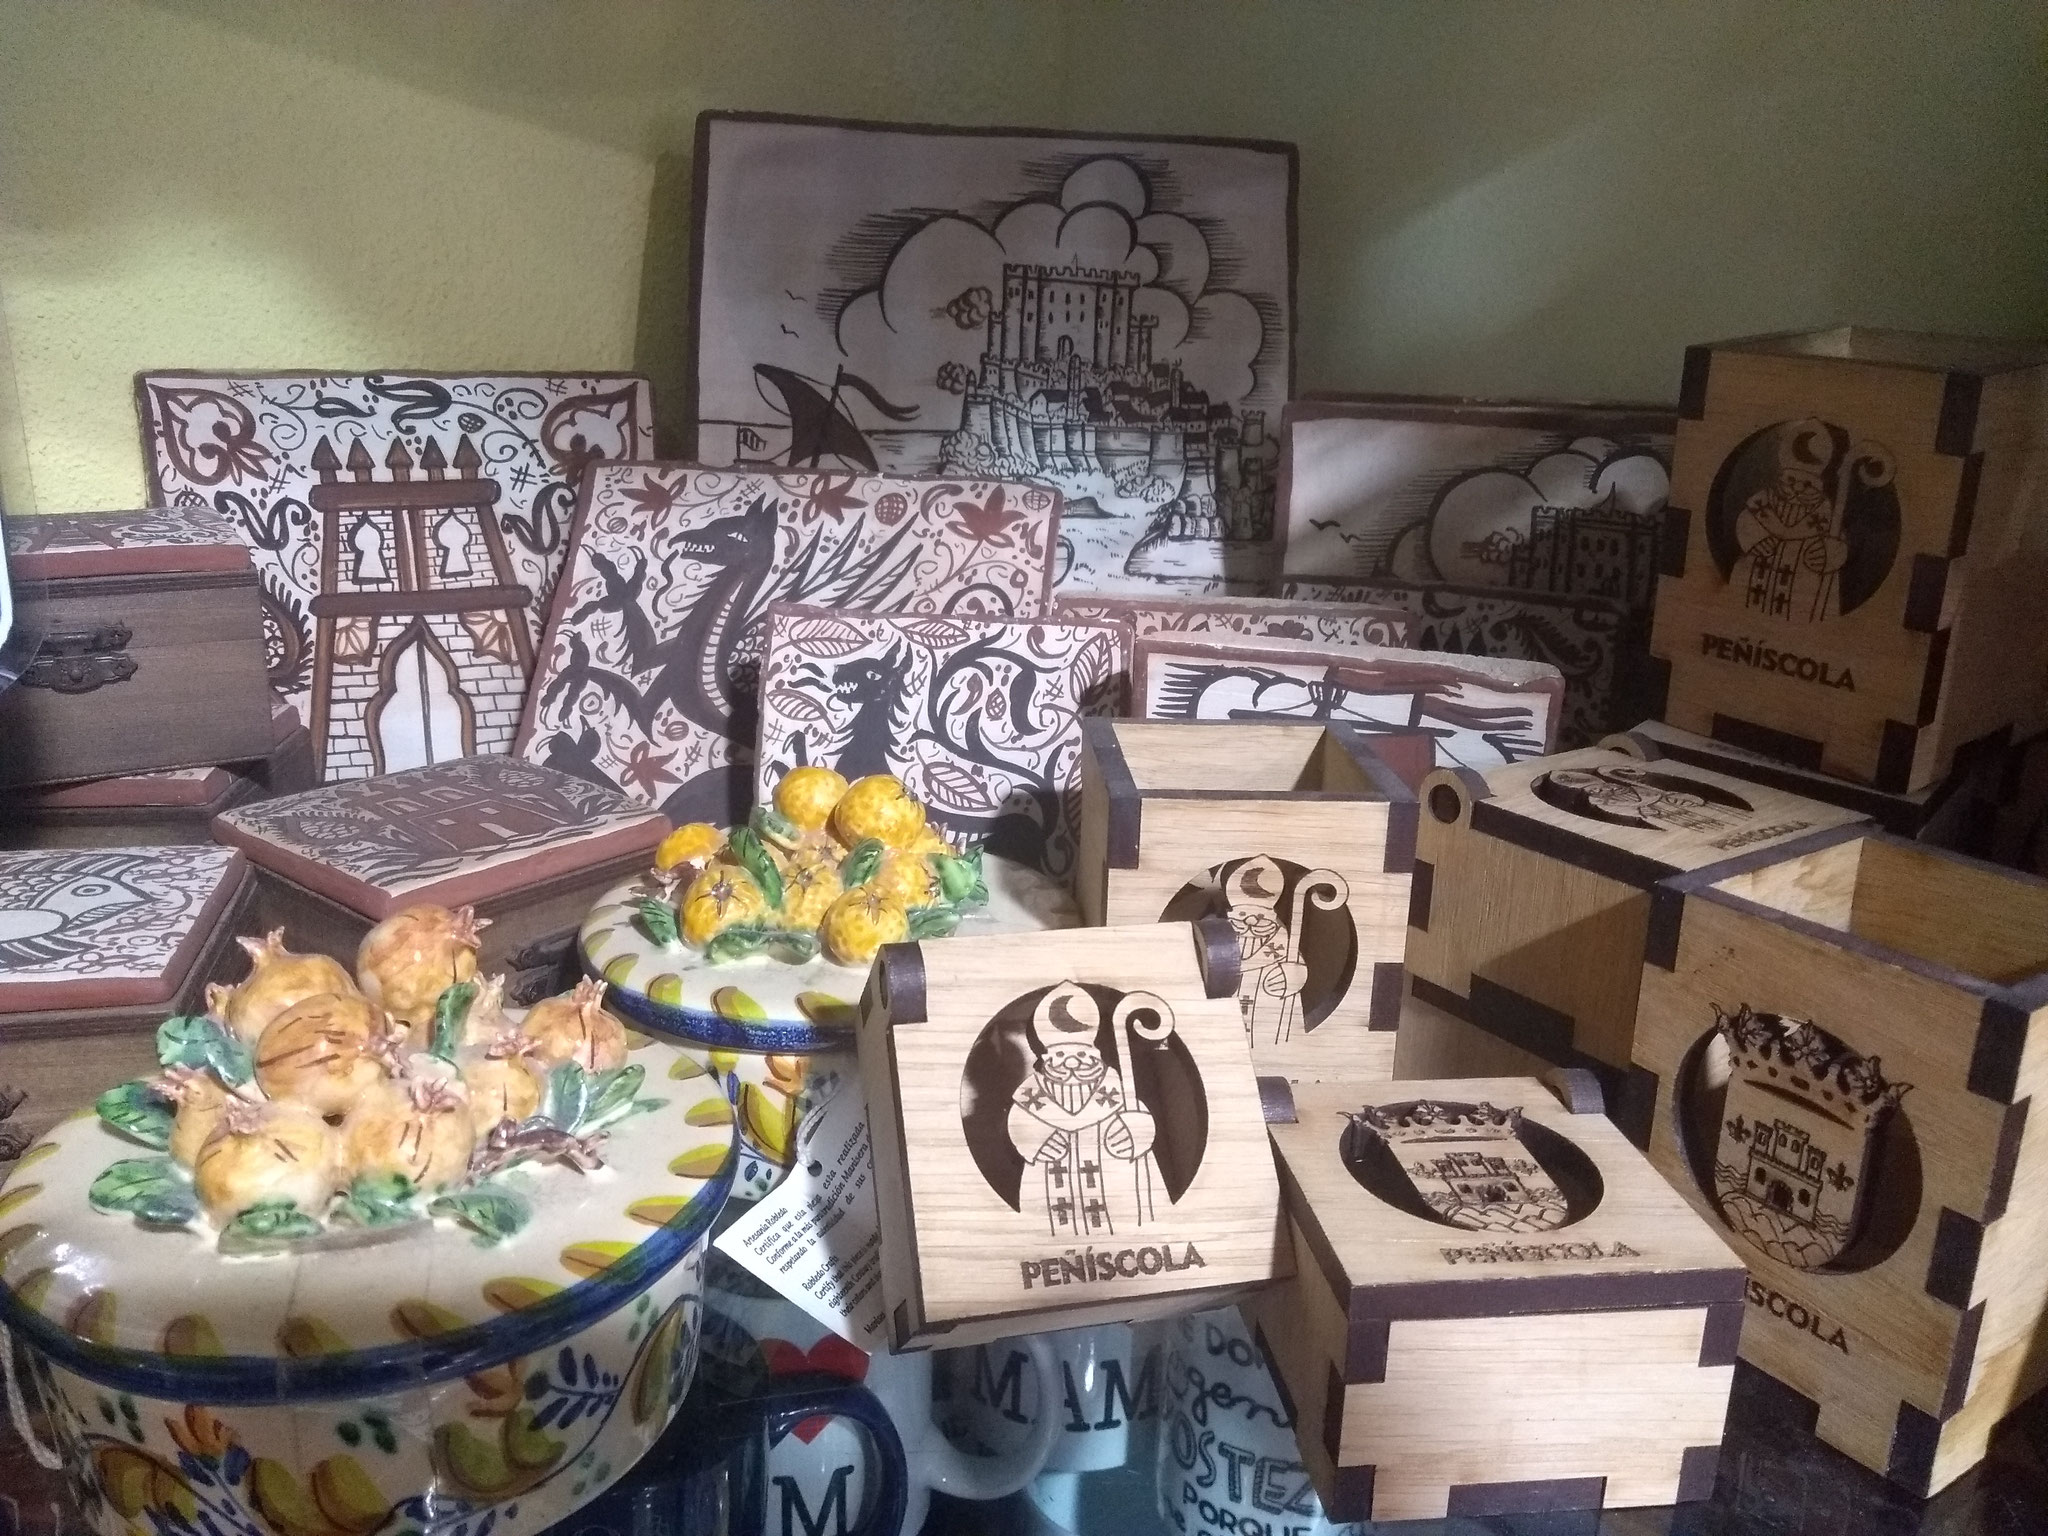 Socarrats y detalles tradicionales en madera.